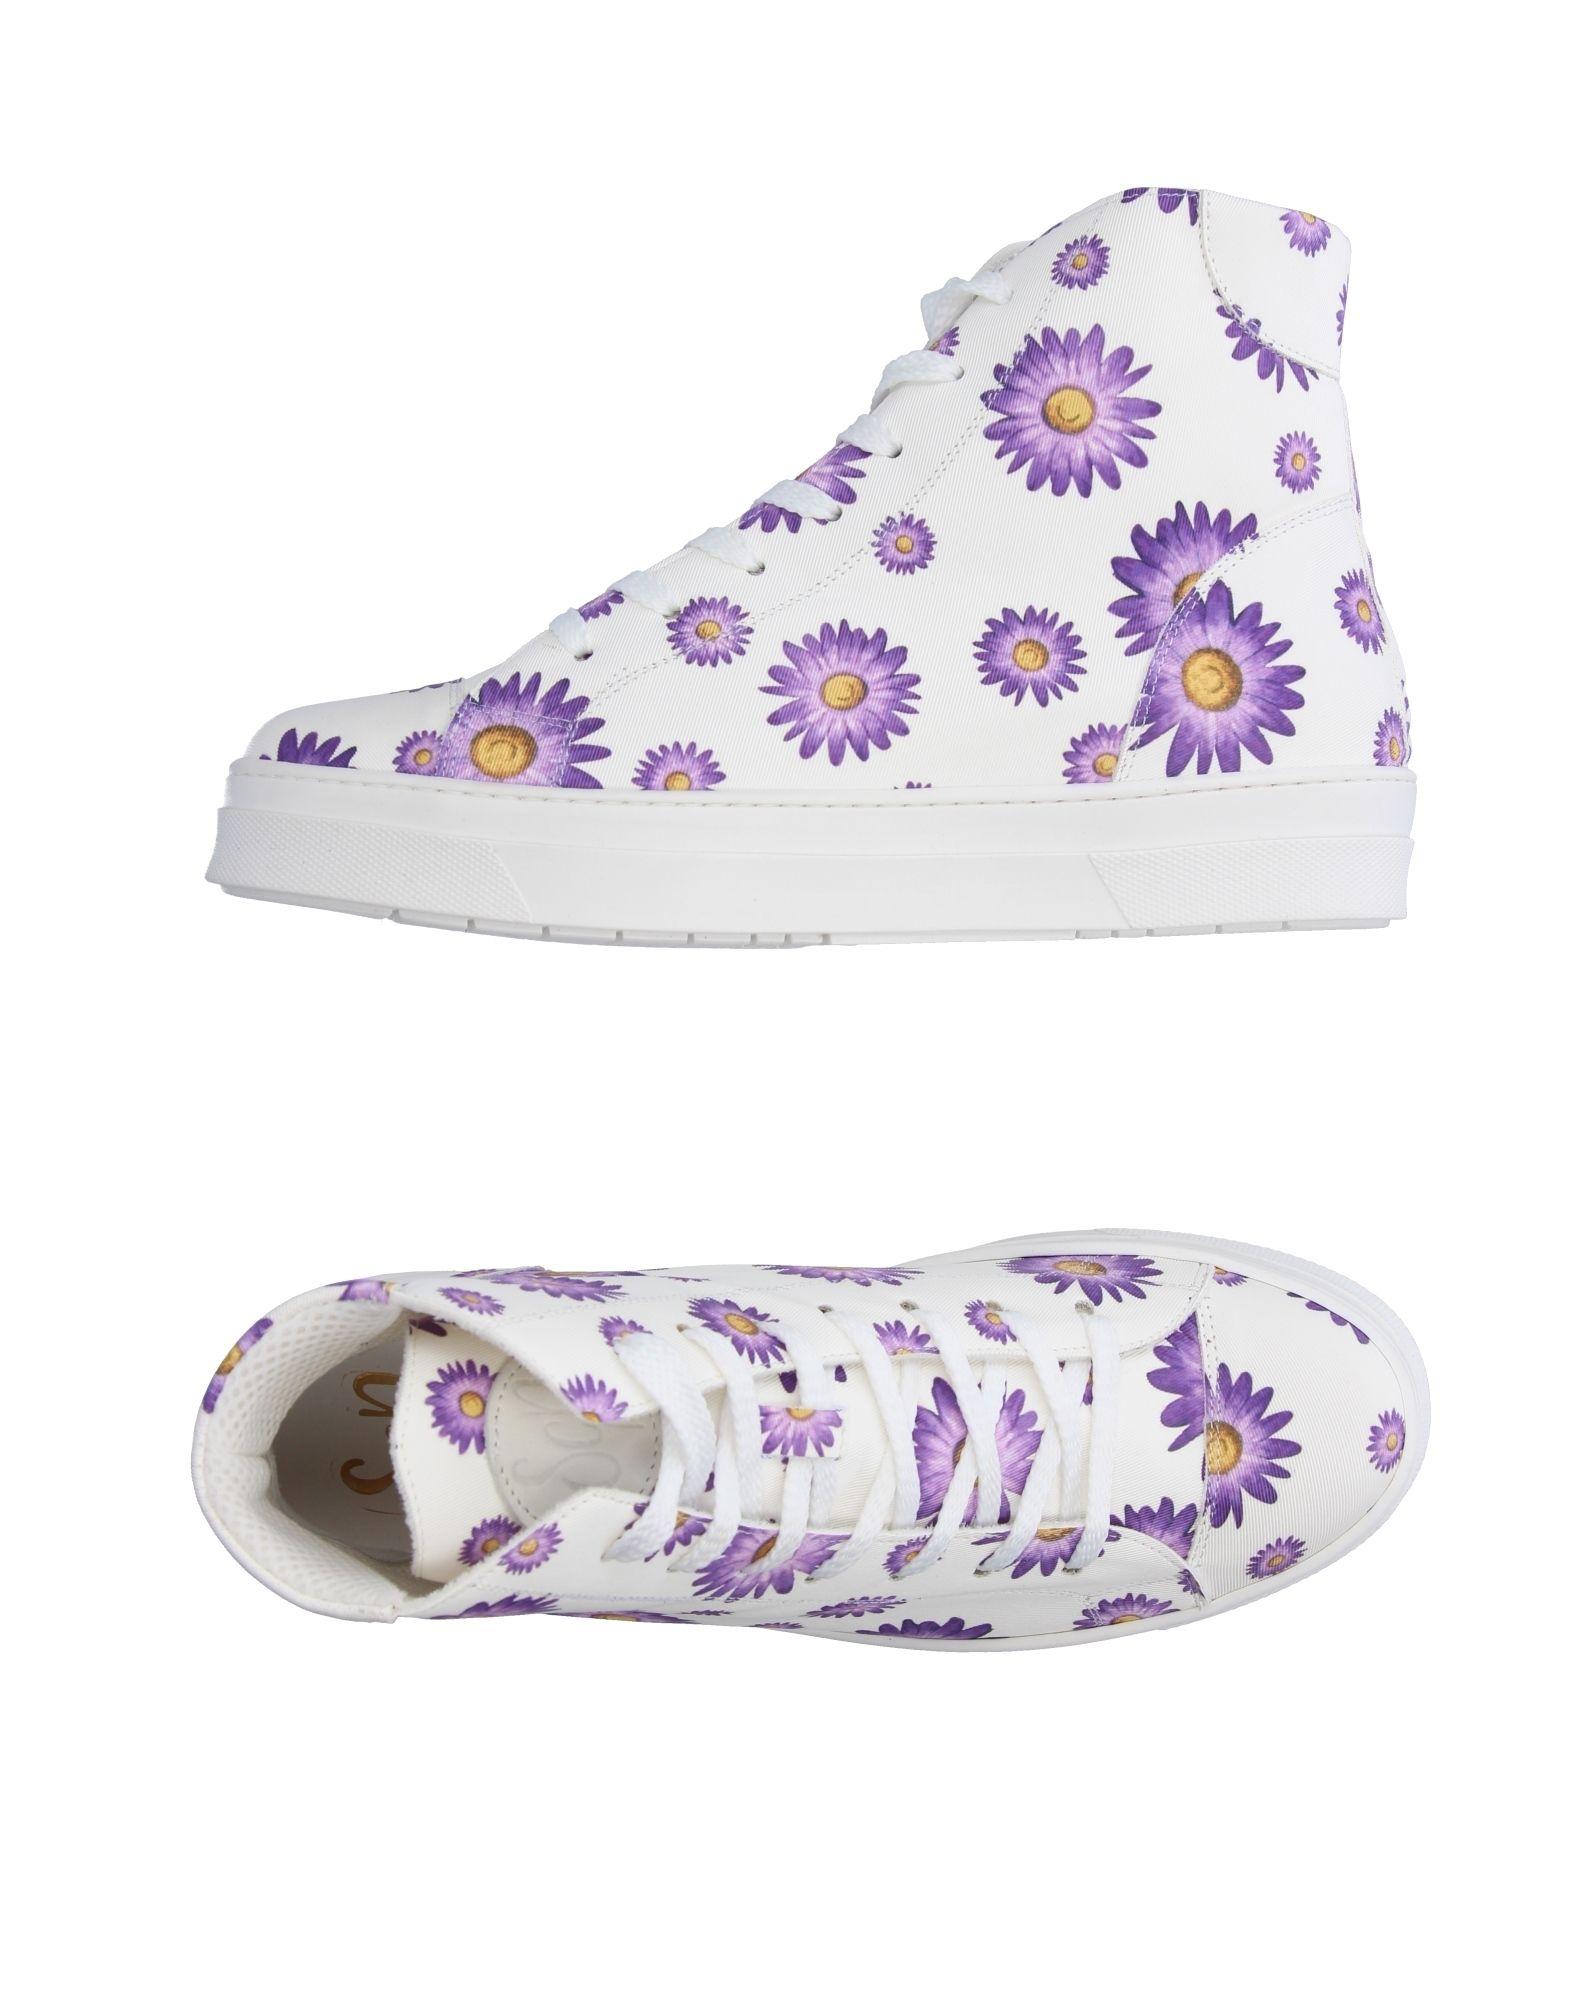 Sgn Giancarlo Giancarlo Giancarlo Paoli Sneakers - Women Sgn Giancarlo Paoli Sneakers online on  United Kingdom - 11218338IS 49c4f4